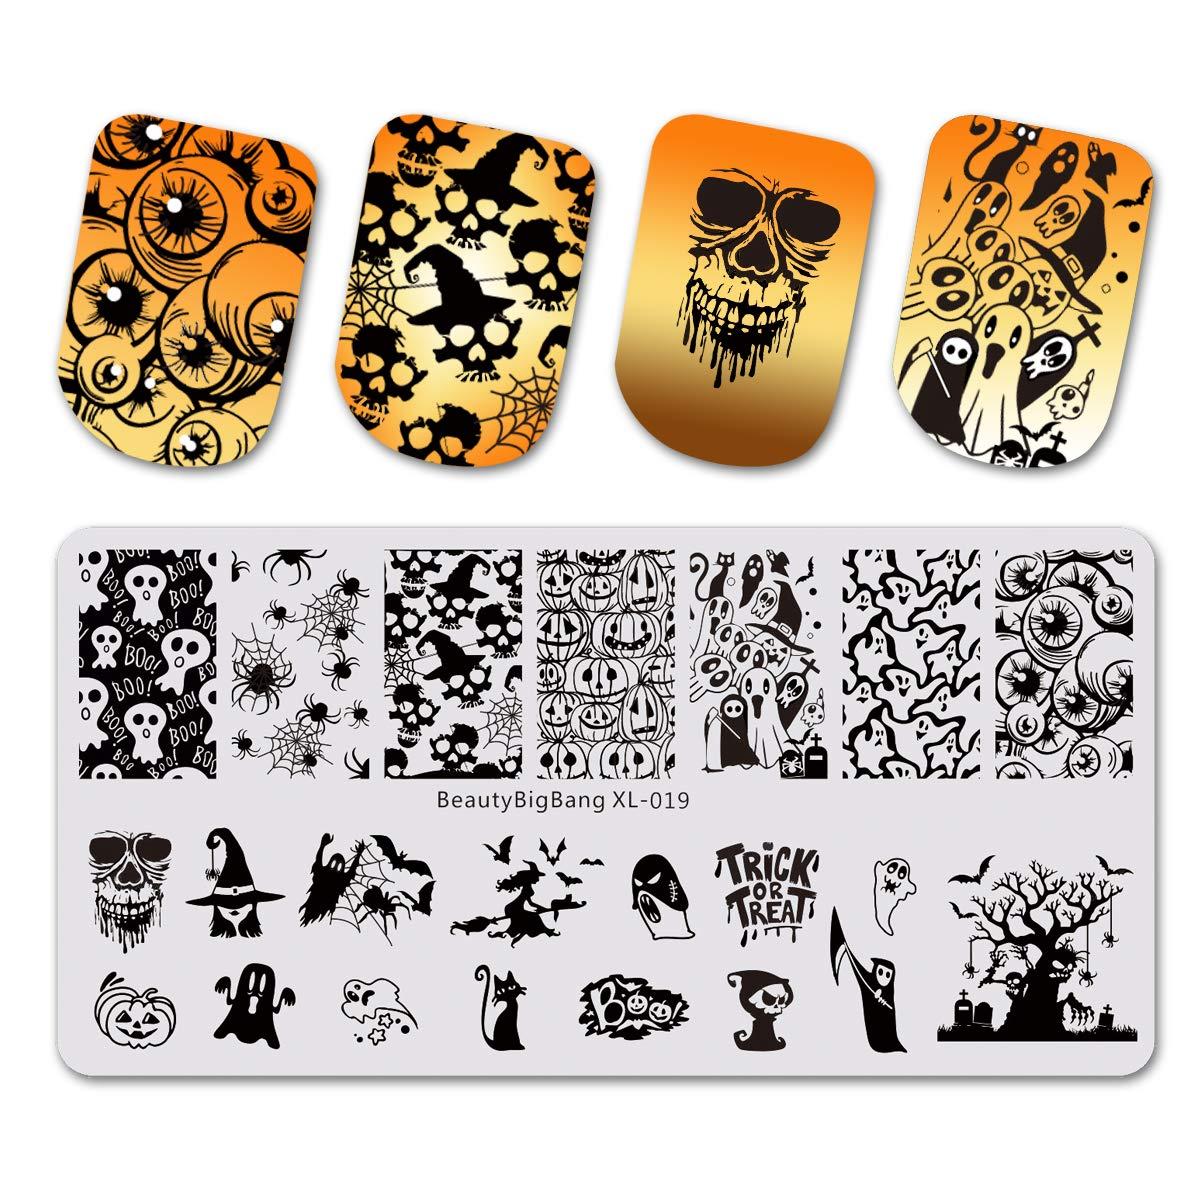 Beautybigbang nail stamping piatti set modelli di immagine scheletro fantasma ragno zucca di Halloween nail art xl-019